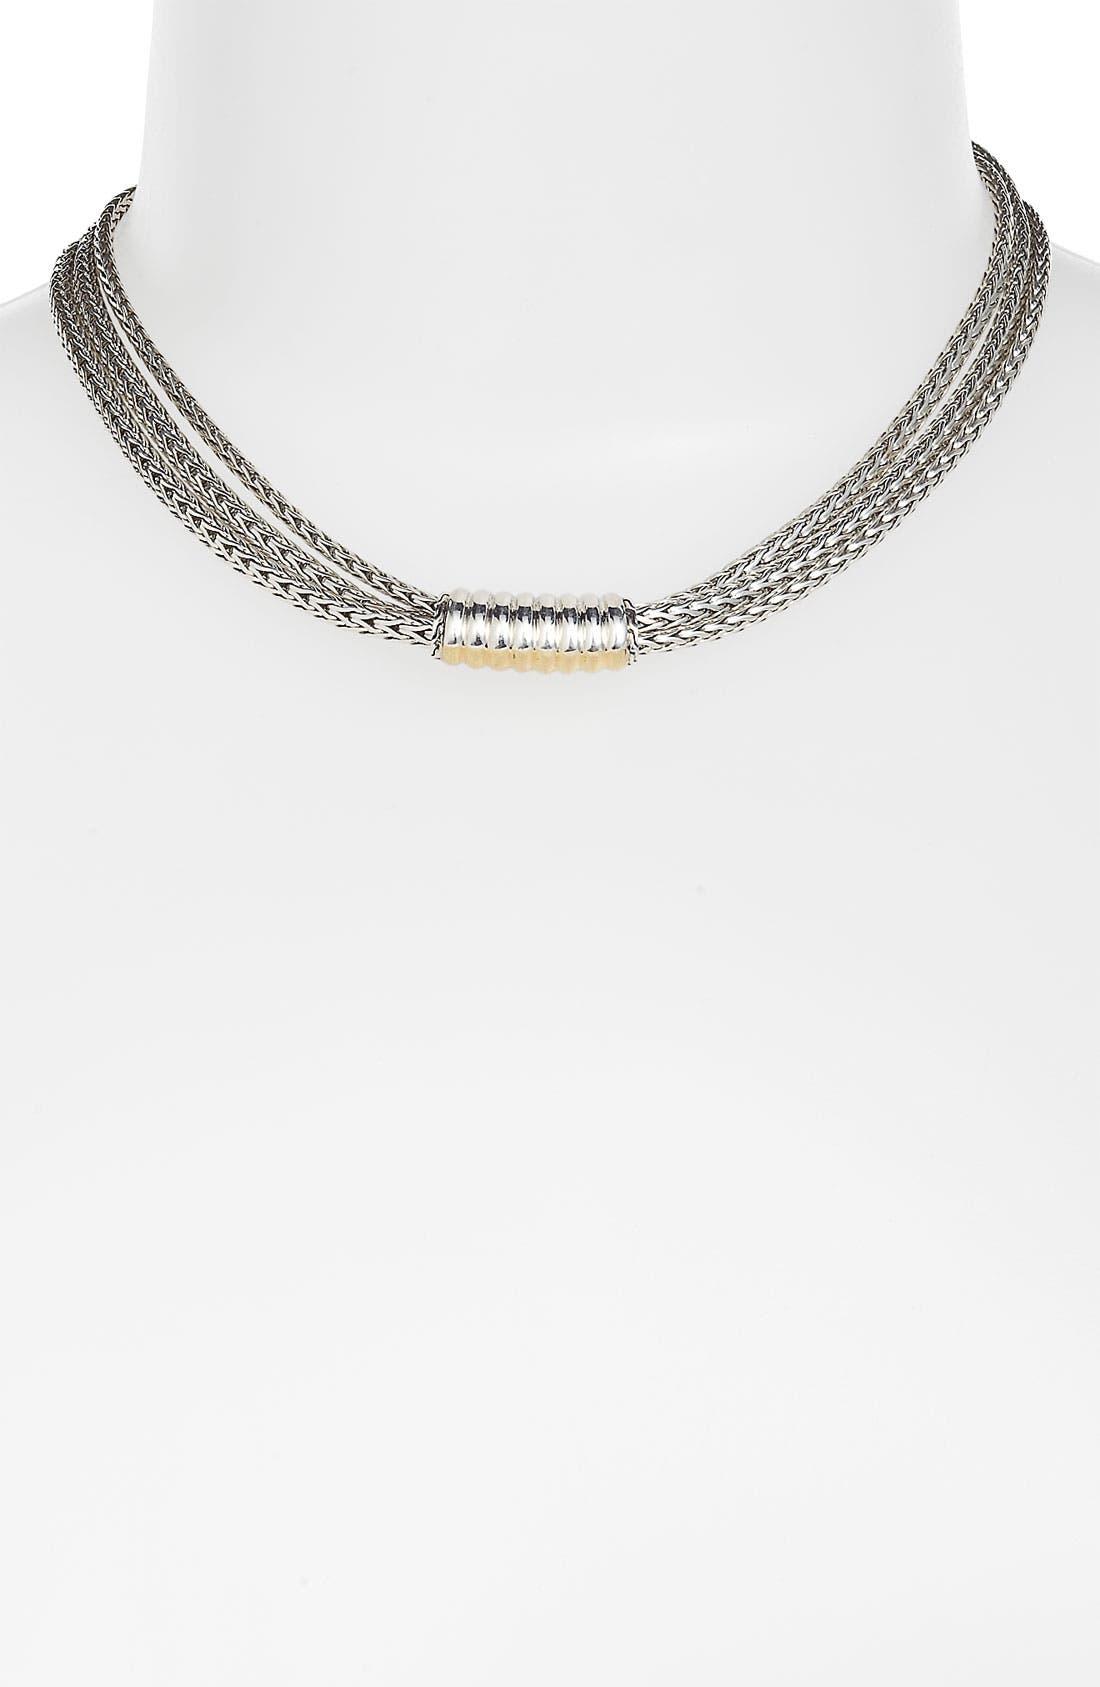 Alternate Image 1 Selected - John Hardy 'Bedeg' Triple Row Chain Necklace